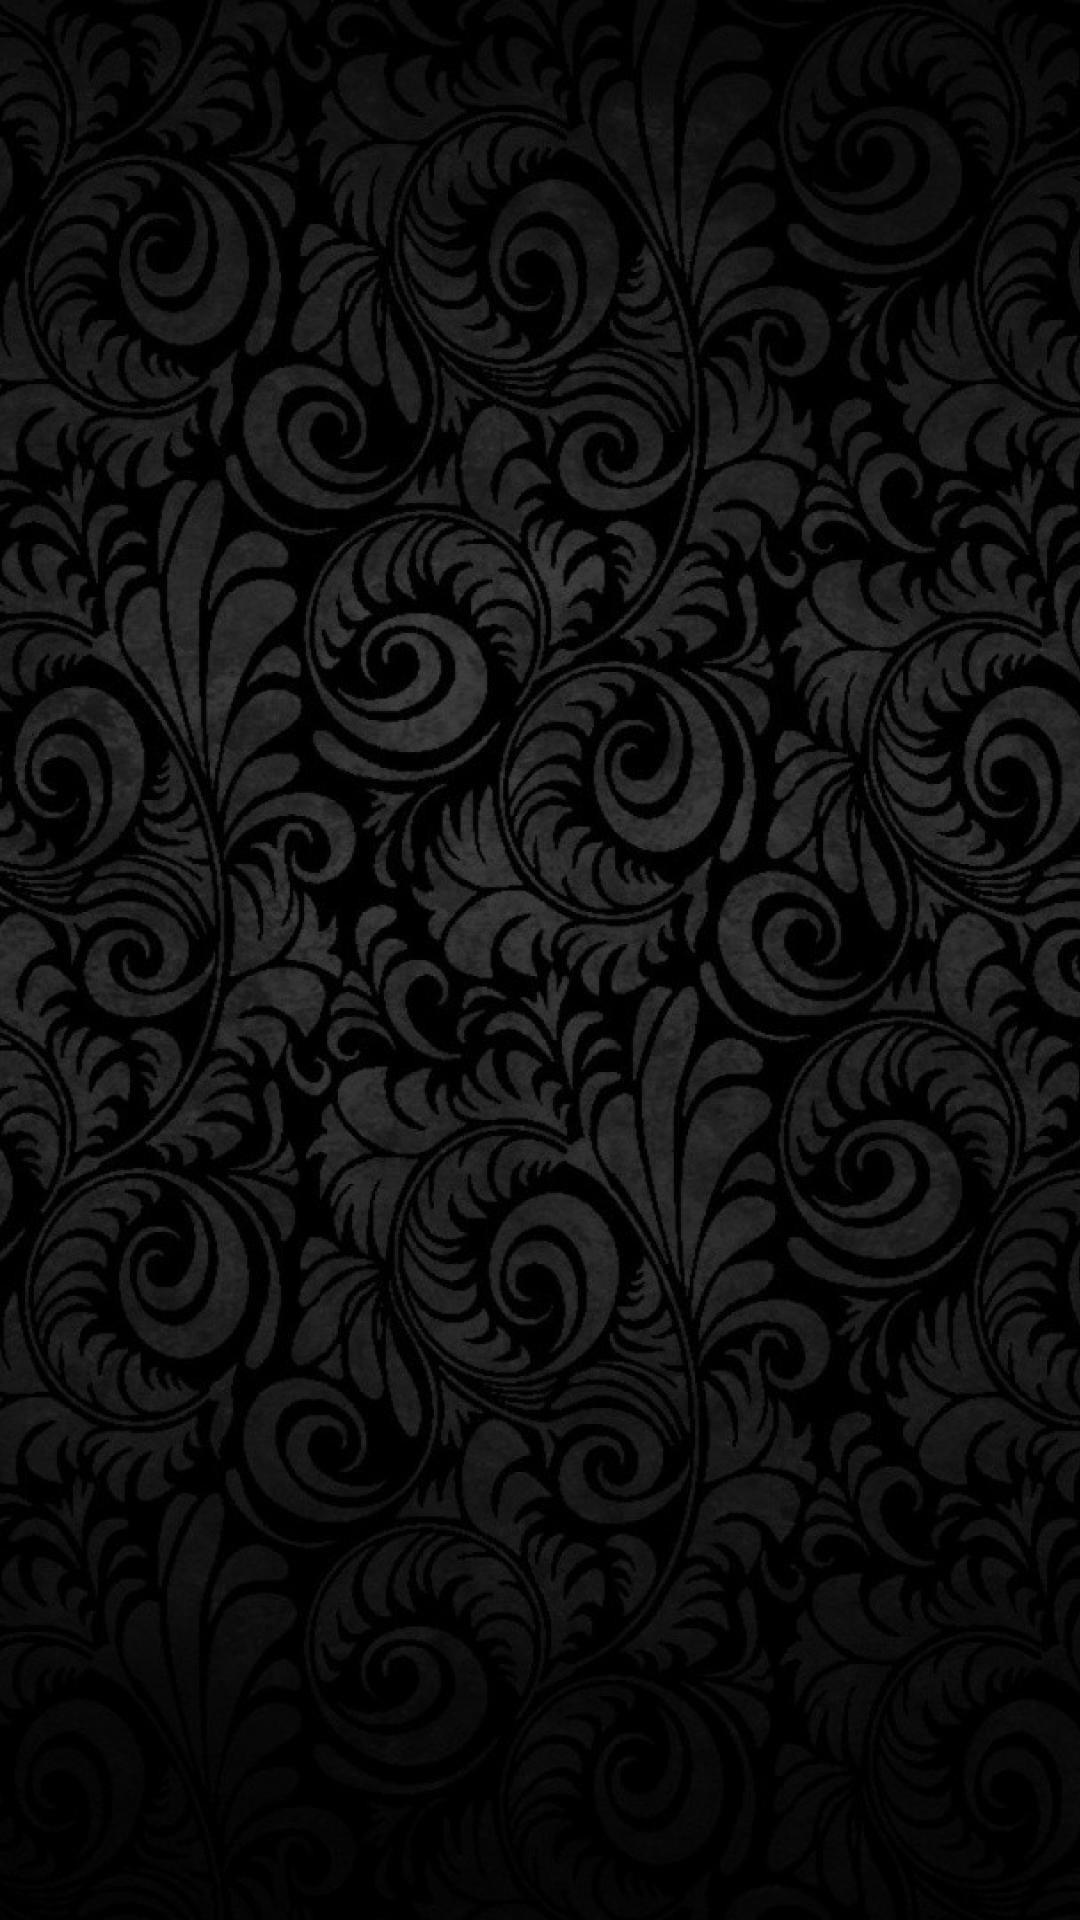 Black Paisley Wallpaper (38+ images)